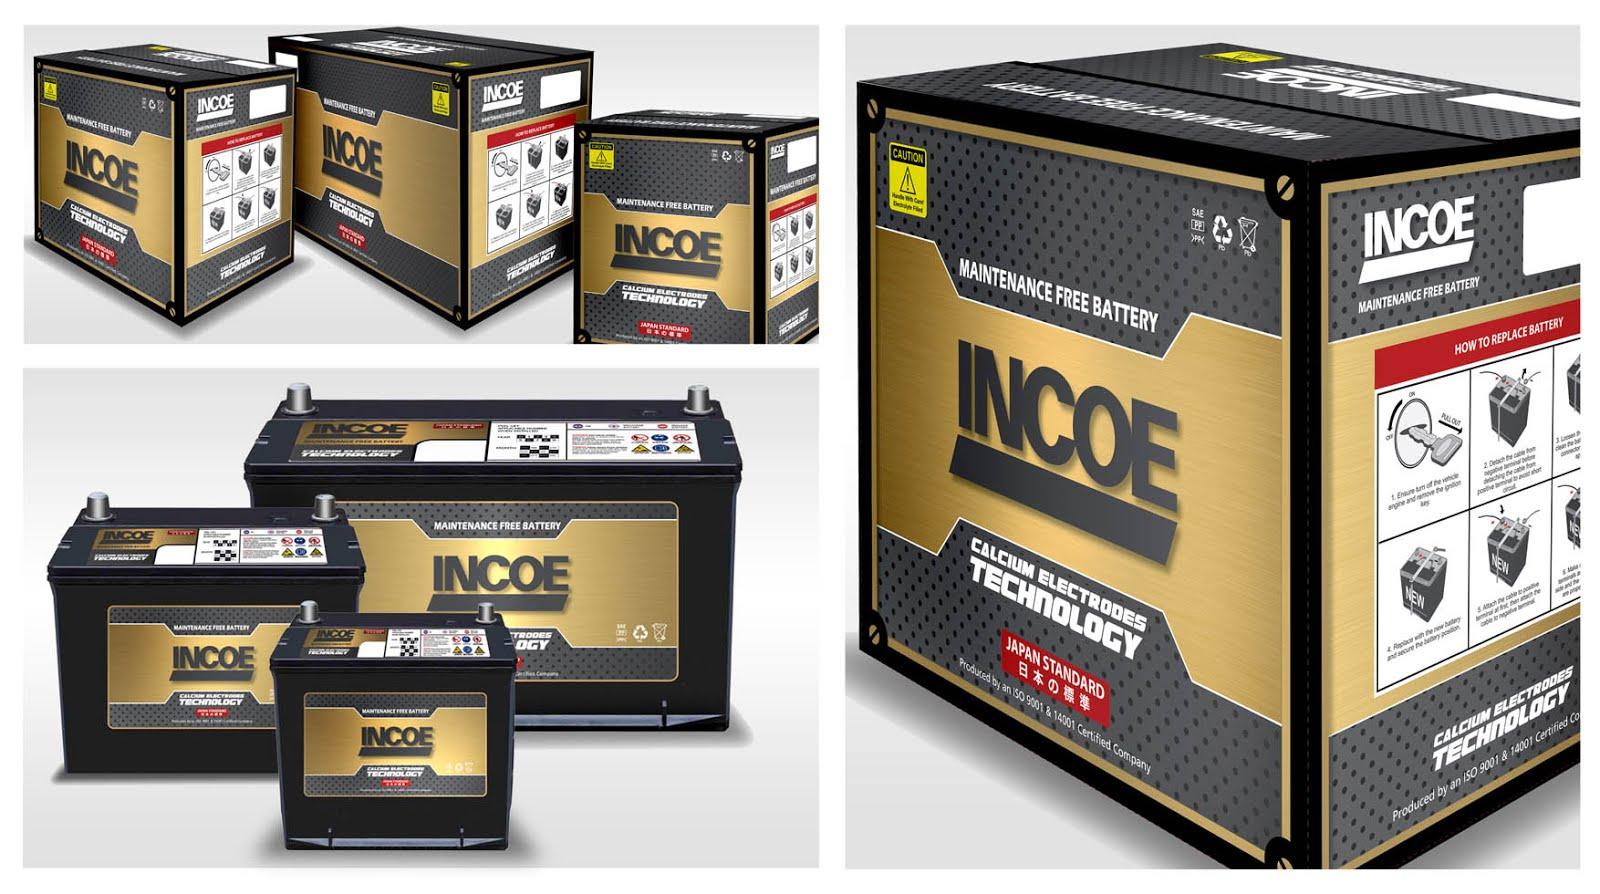 Incoe battery